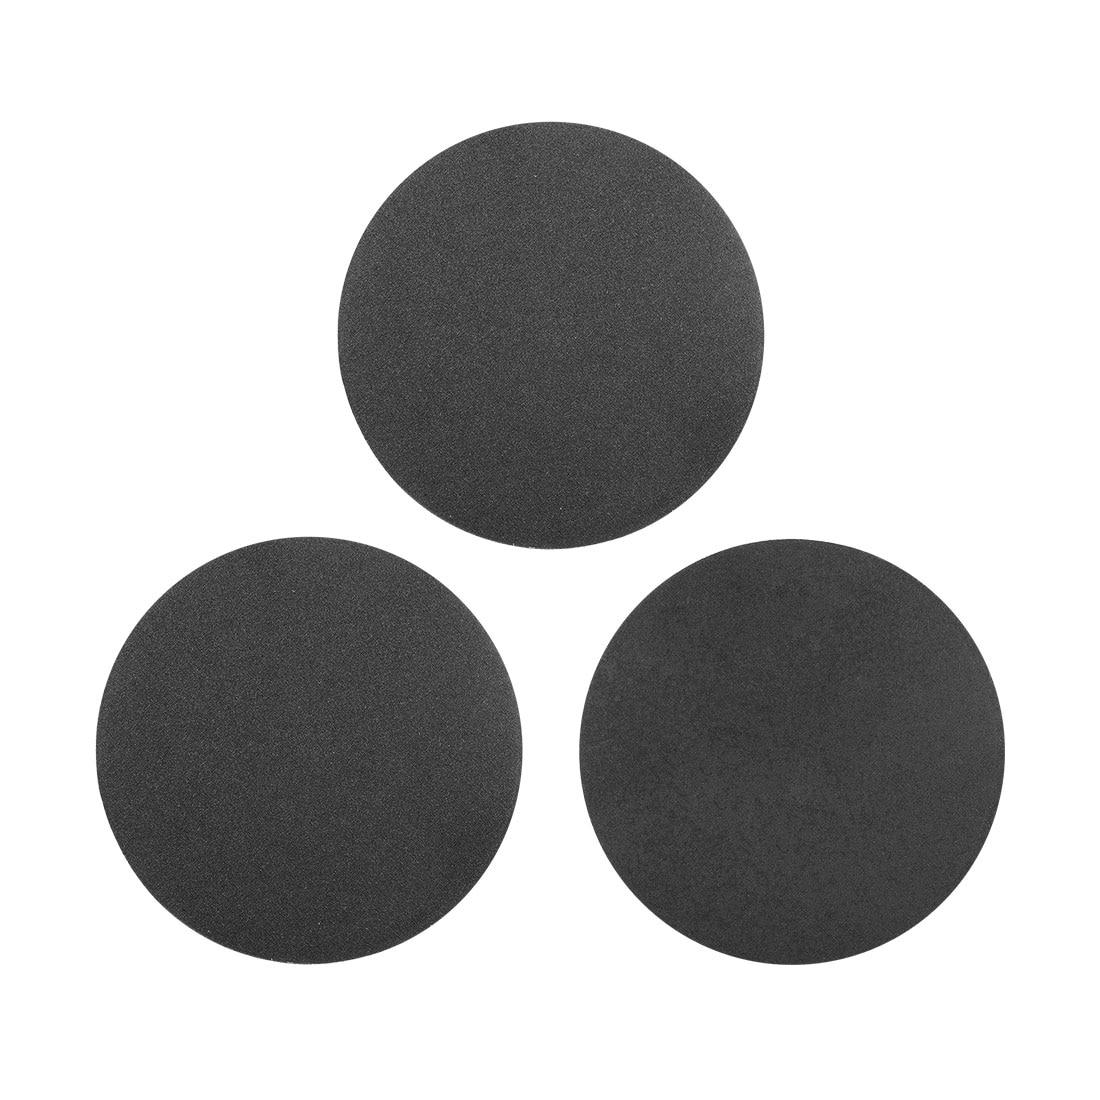 Gancho e Laço Disco de Lixamento Carboneto de Silício Sortido para a Mobília de Polimento Uxcell Pces Molhado – Seco 120 180 320 Grão 15 5-polegada